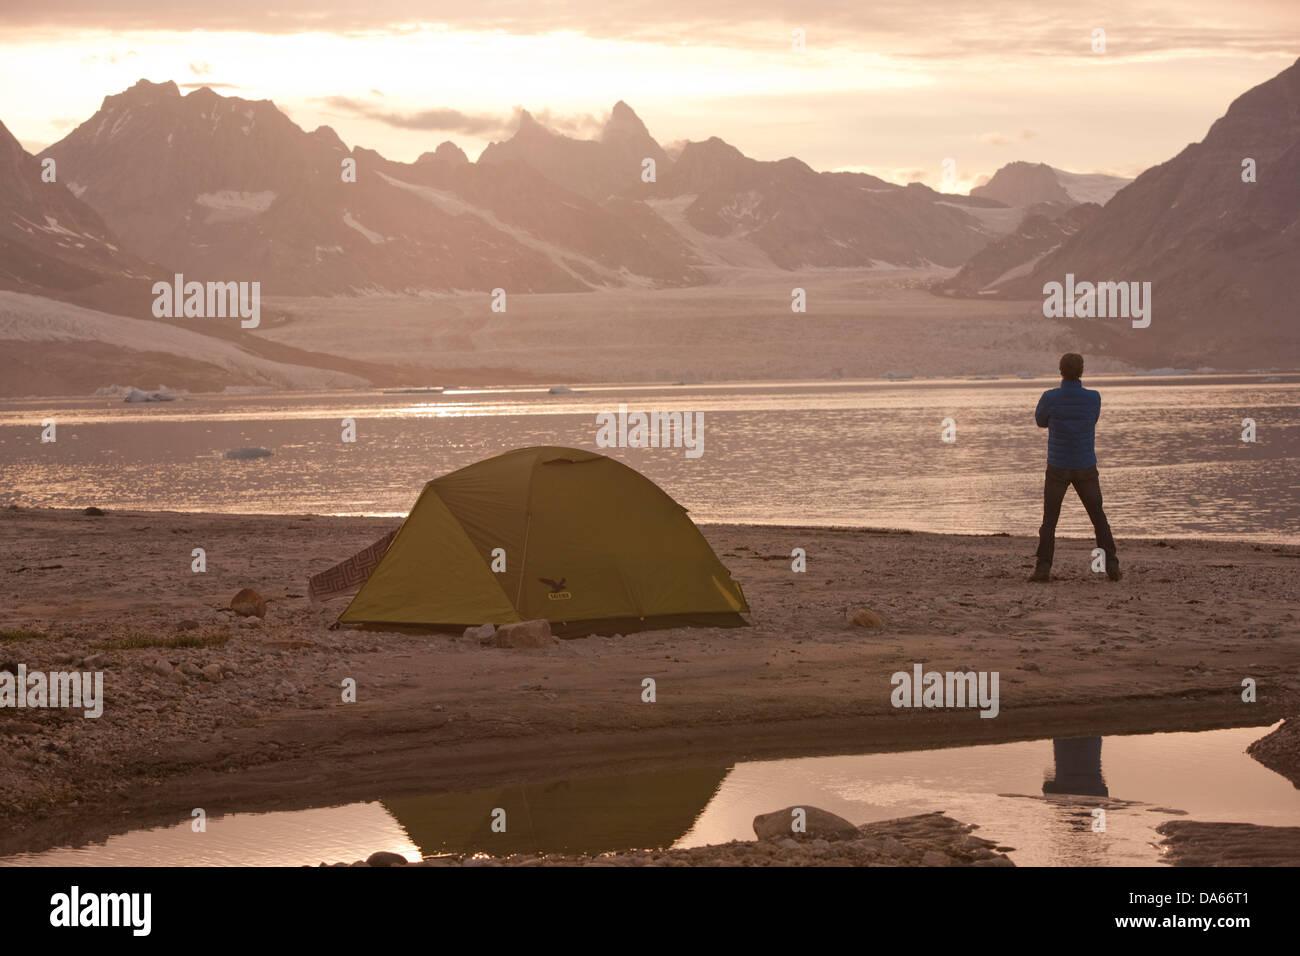 Camping, Karale, Greenland, East Greenland, glacier, ice, moraine, man, tent, trekking, Sermiligaaq, - Stock Image